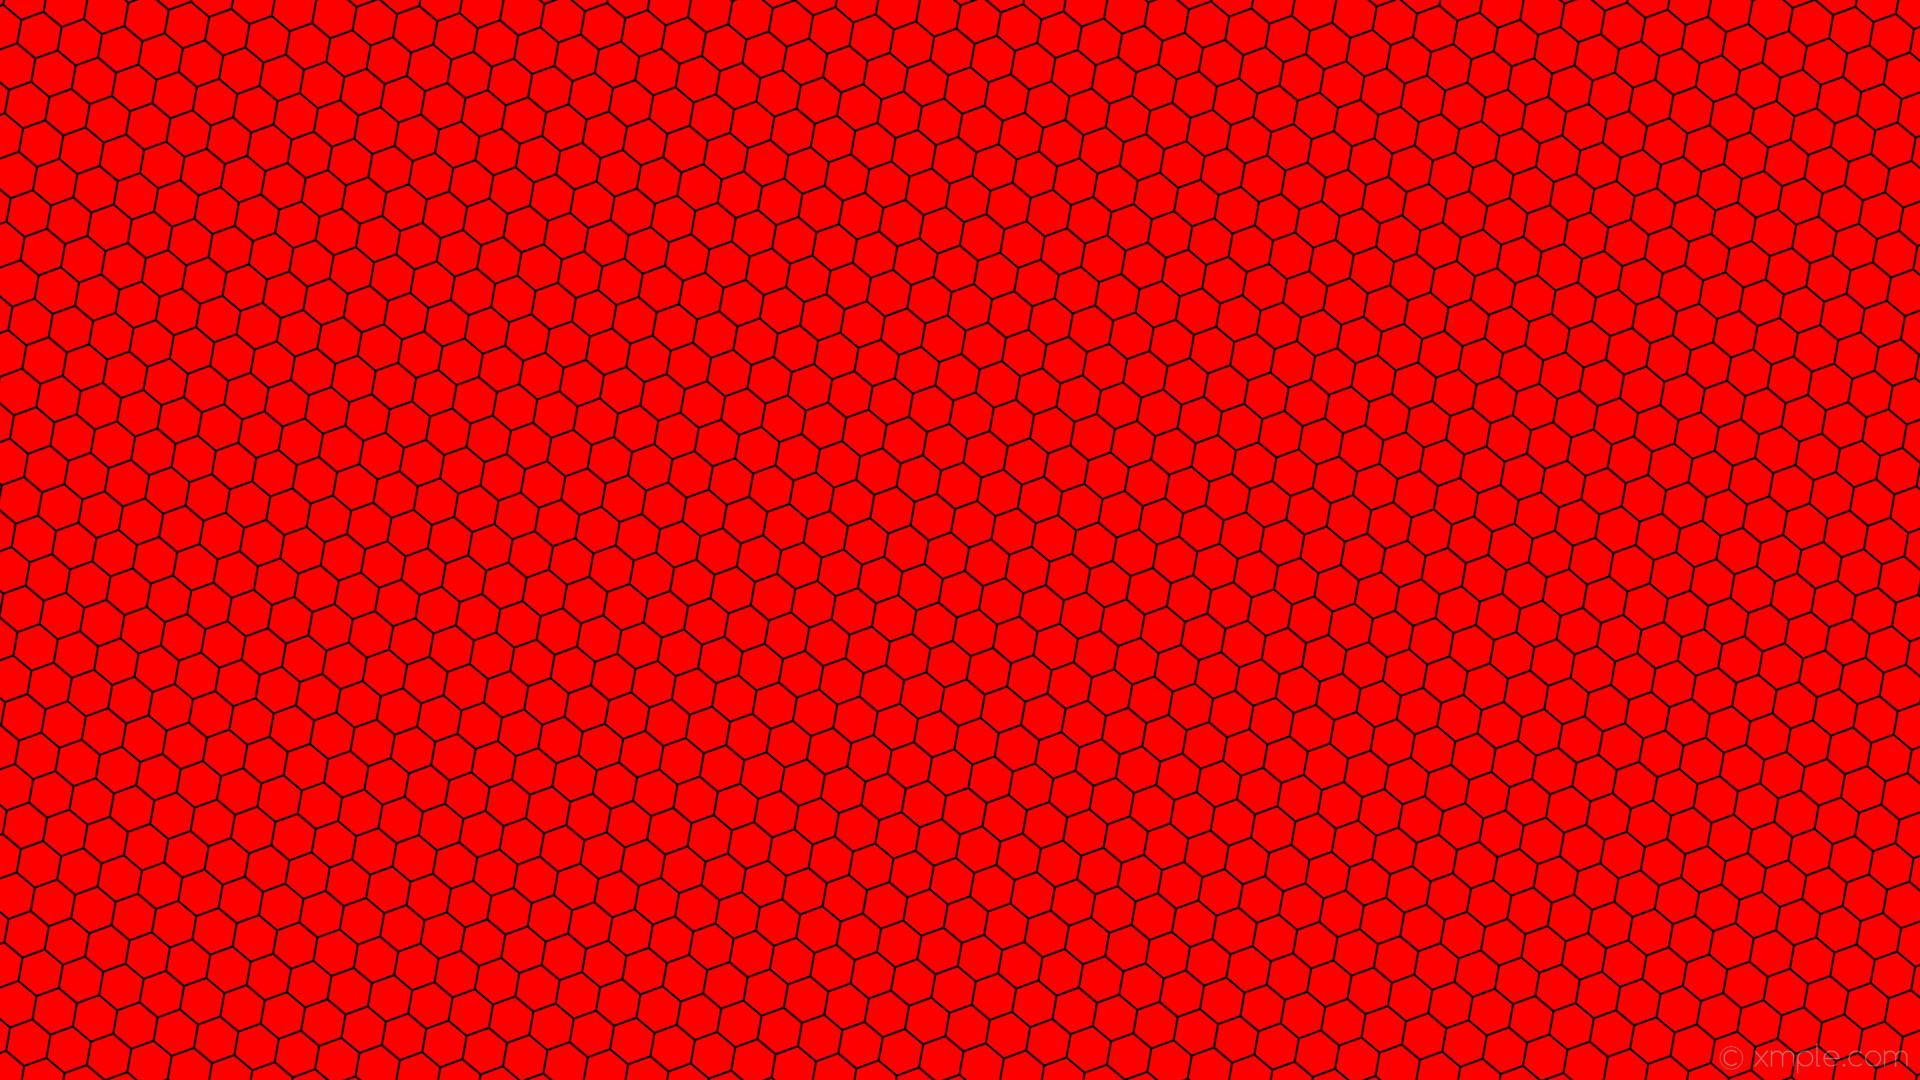 wallpaper beehive hexagon red honeycomb black #ff0000 #000000 diagonal 50°  2px 41px